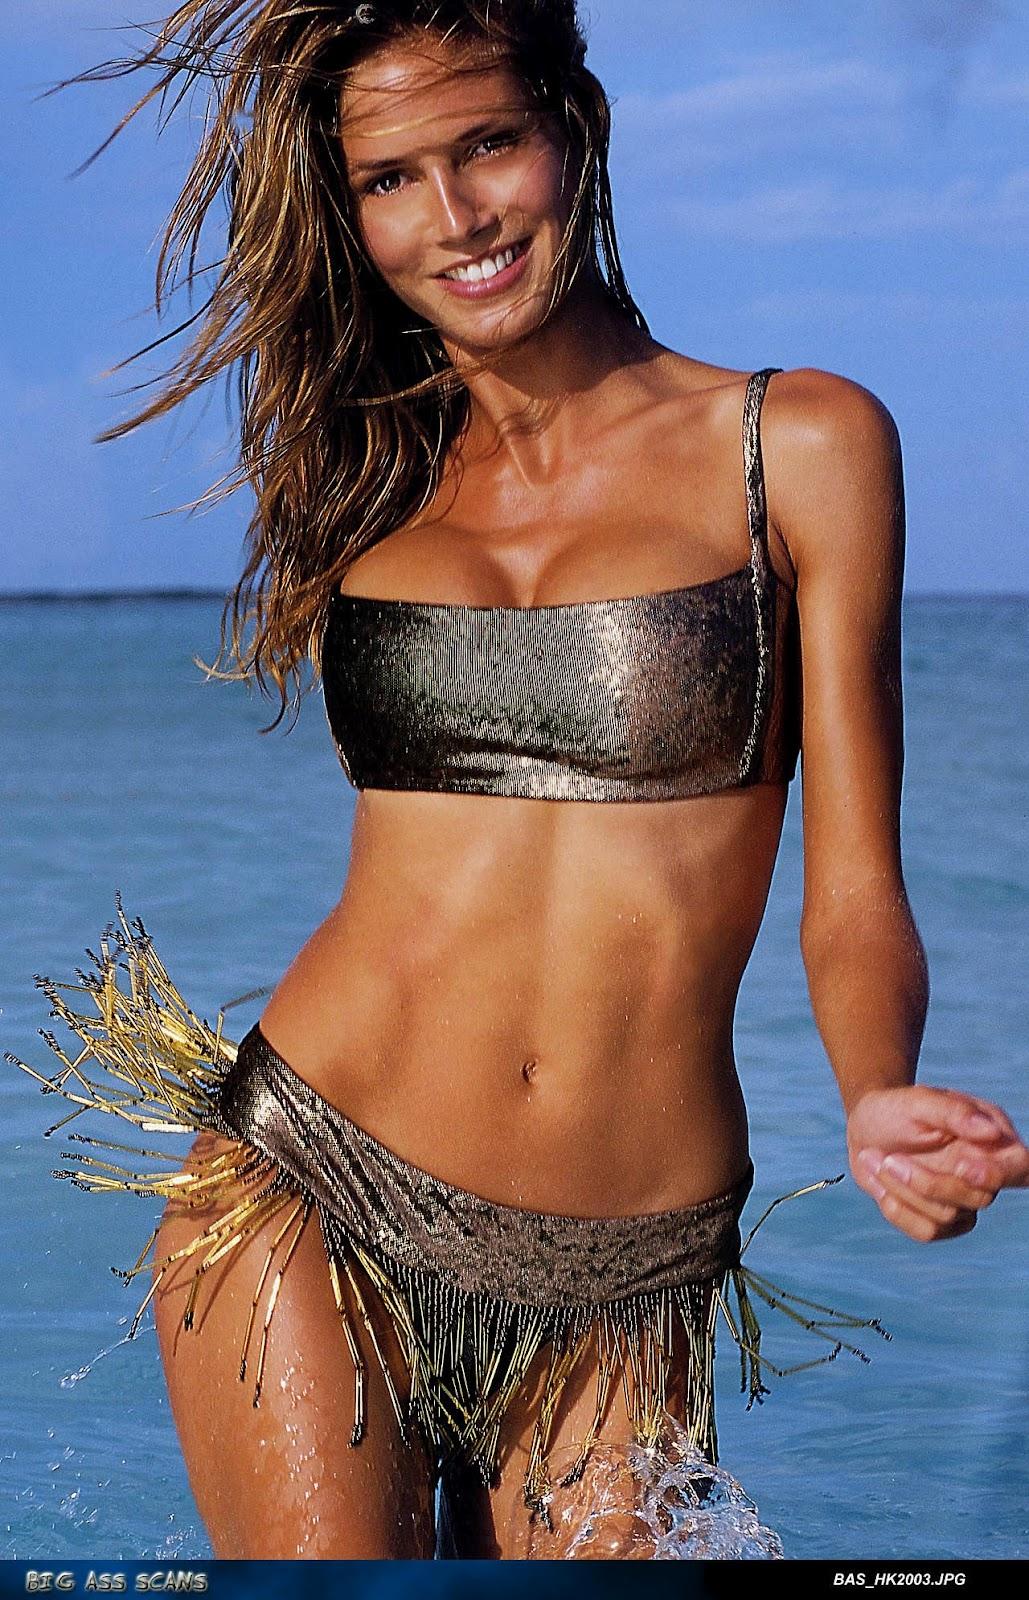 http://3.bp.blogspot.com/-Fsr_a6o8SSE/T617uQEE6xI/AAAAAAAAAIY/UACEOWAQhuk/s1600/Heidi-Klum.jpg